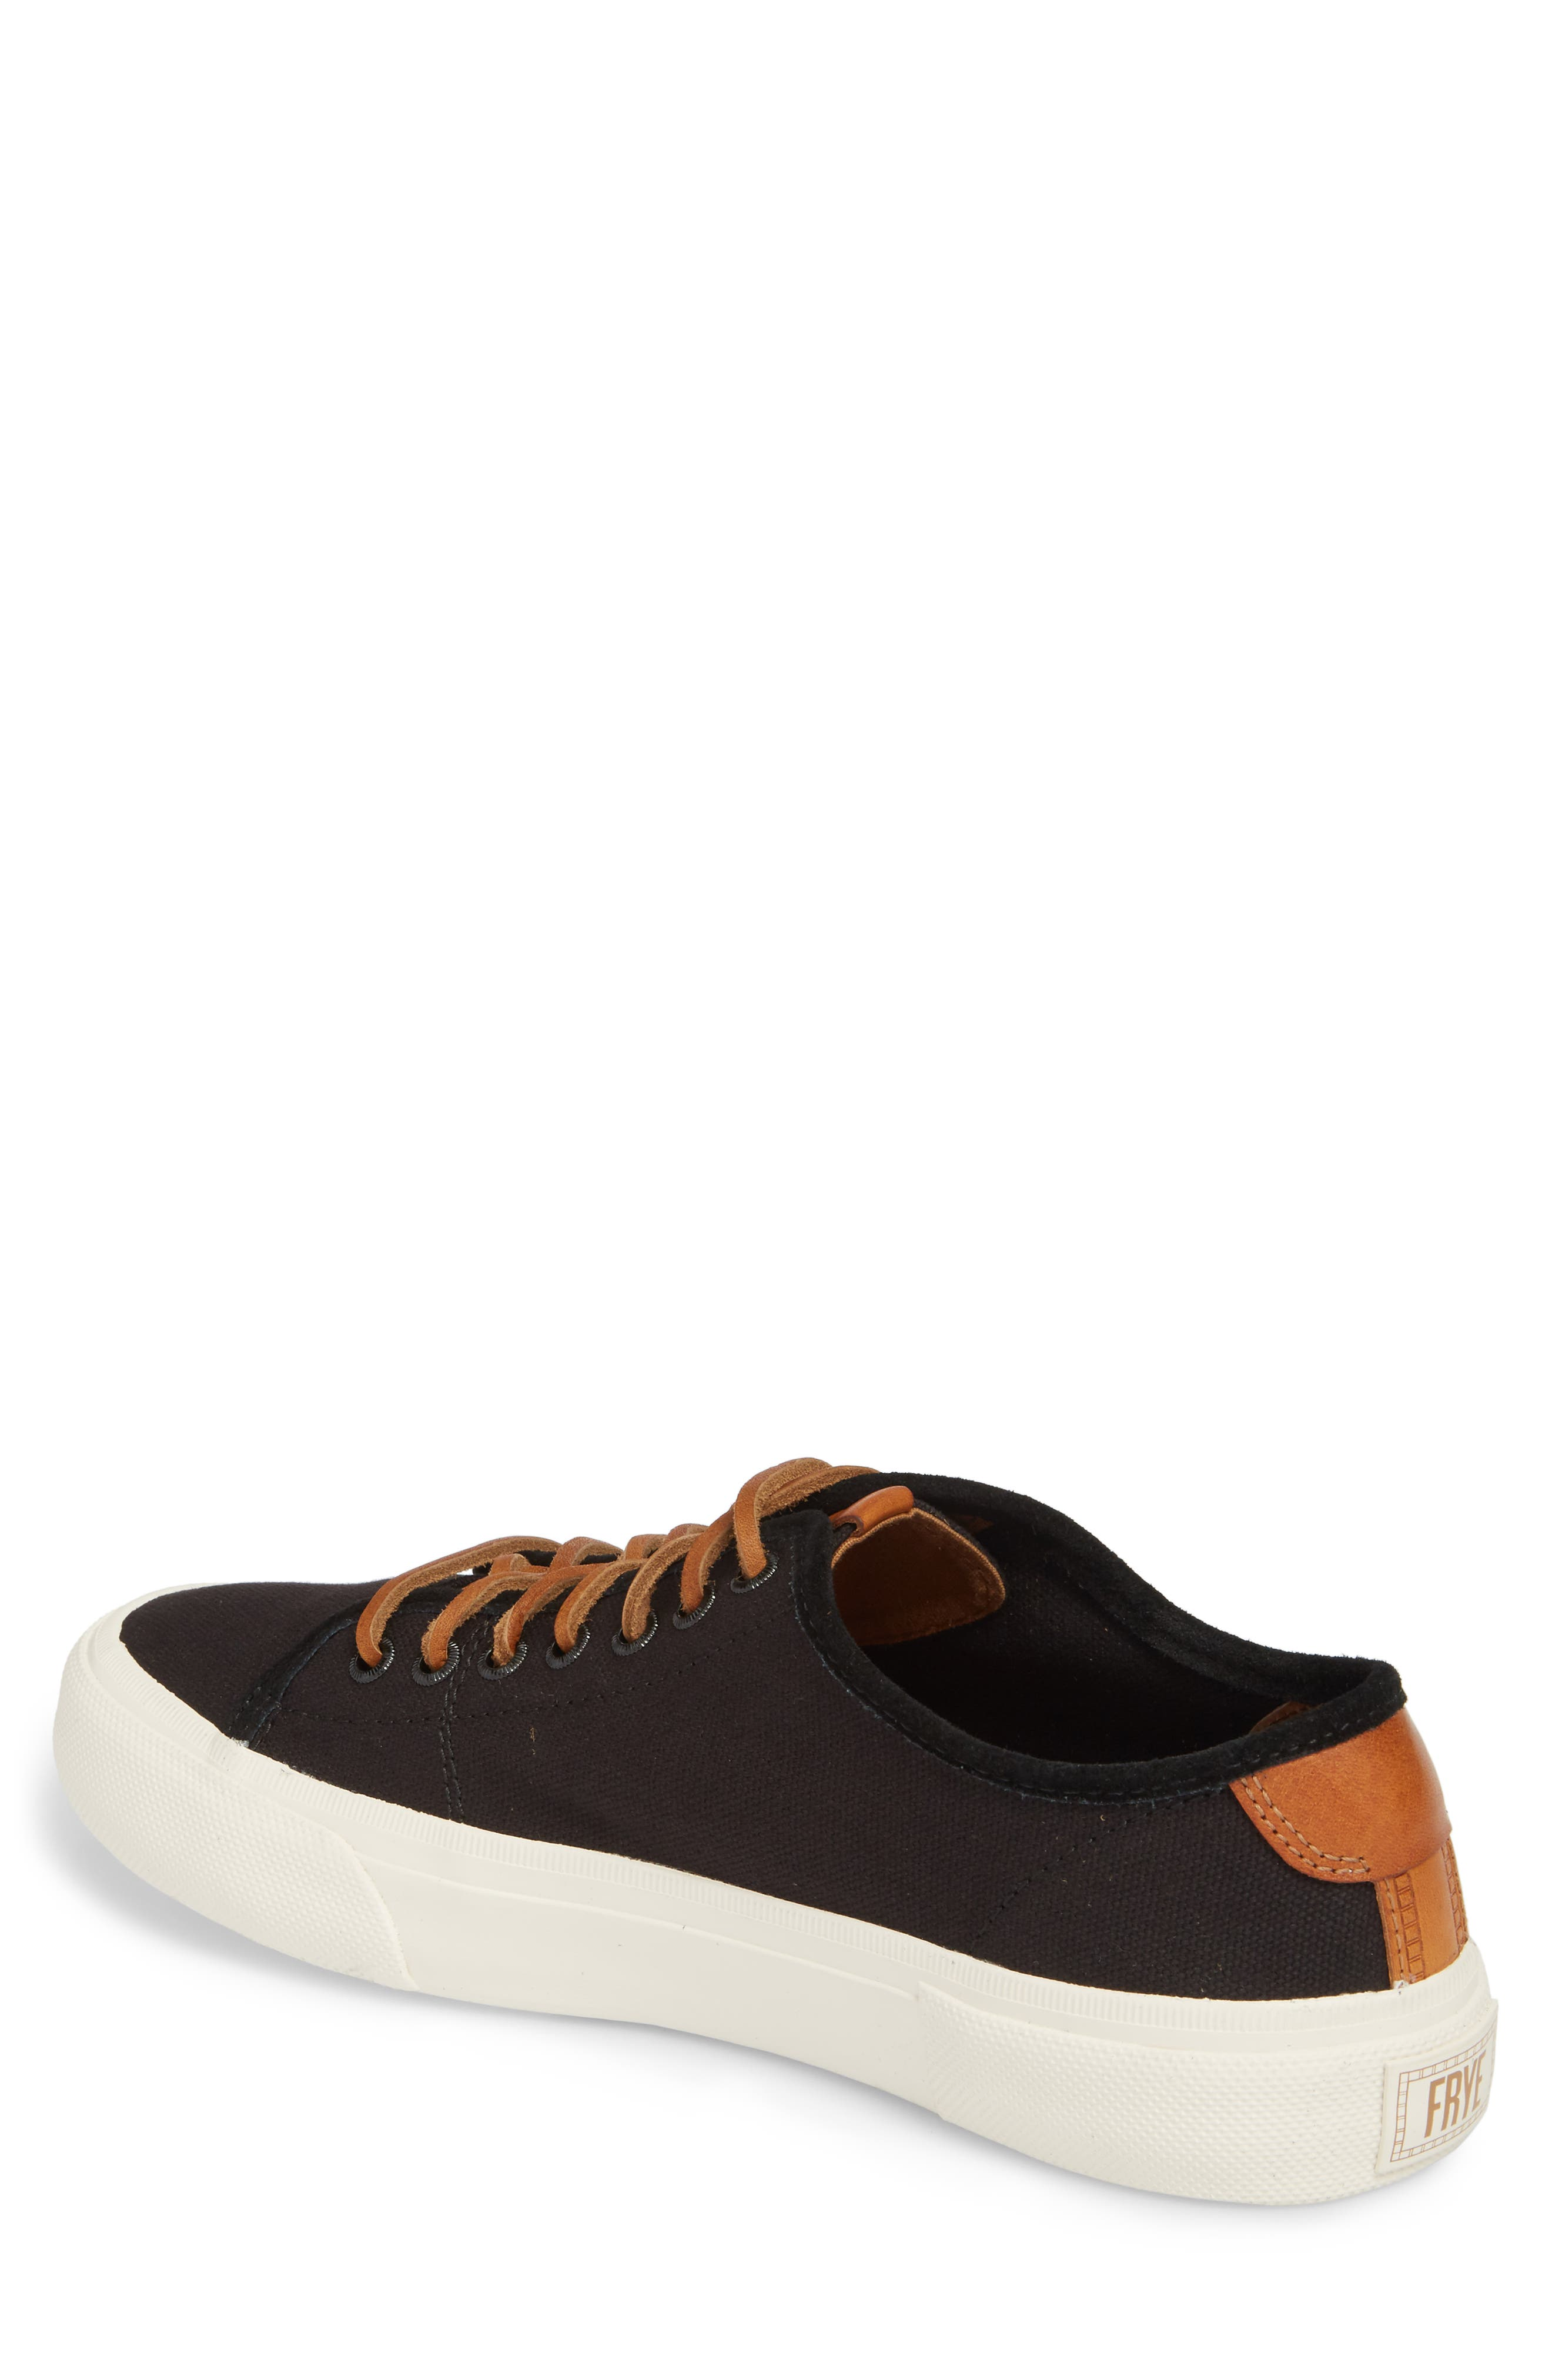 Ludlow Low Top Sneaker,                             Alternate thumbnail 2, color,                             001